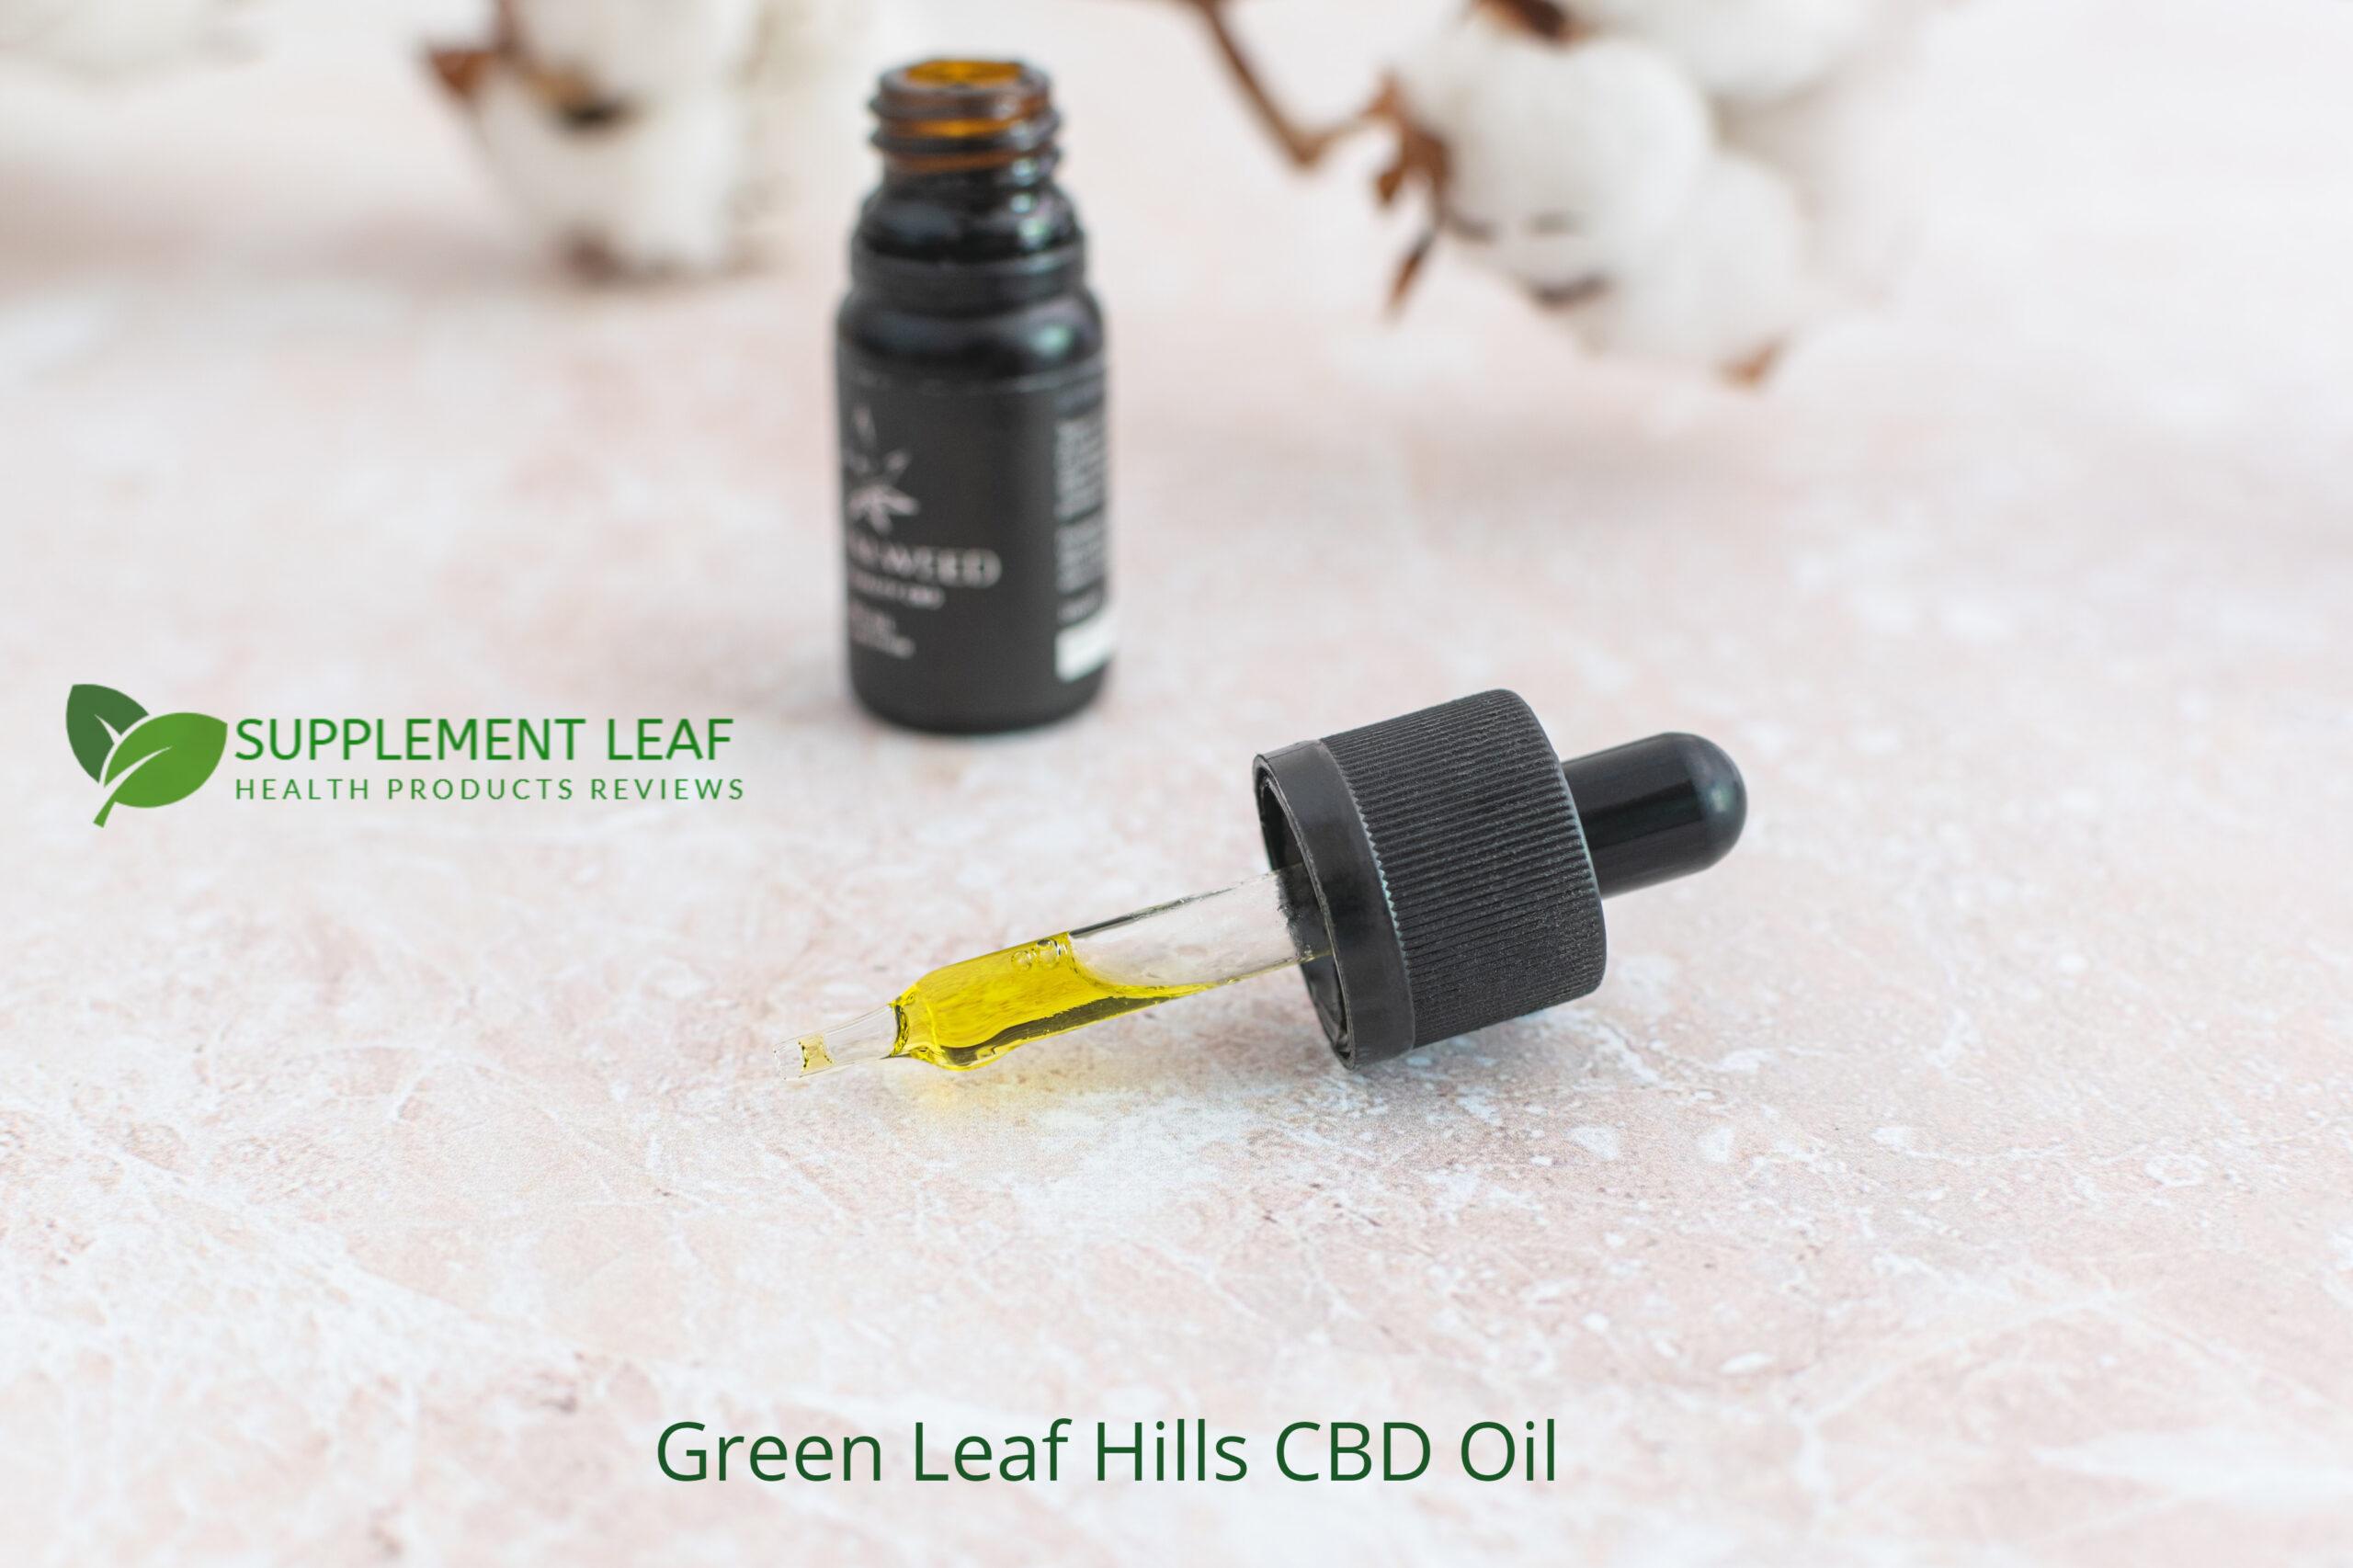 Green Leaf Hills CBD Oil Reviews